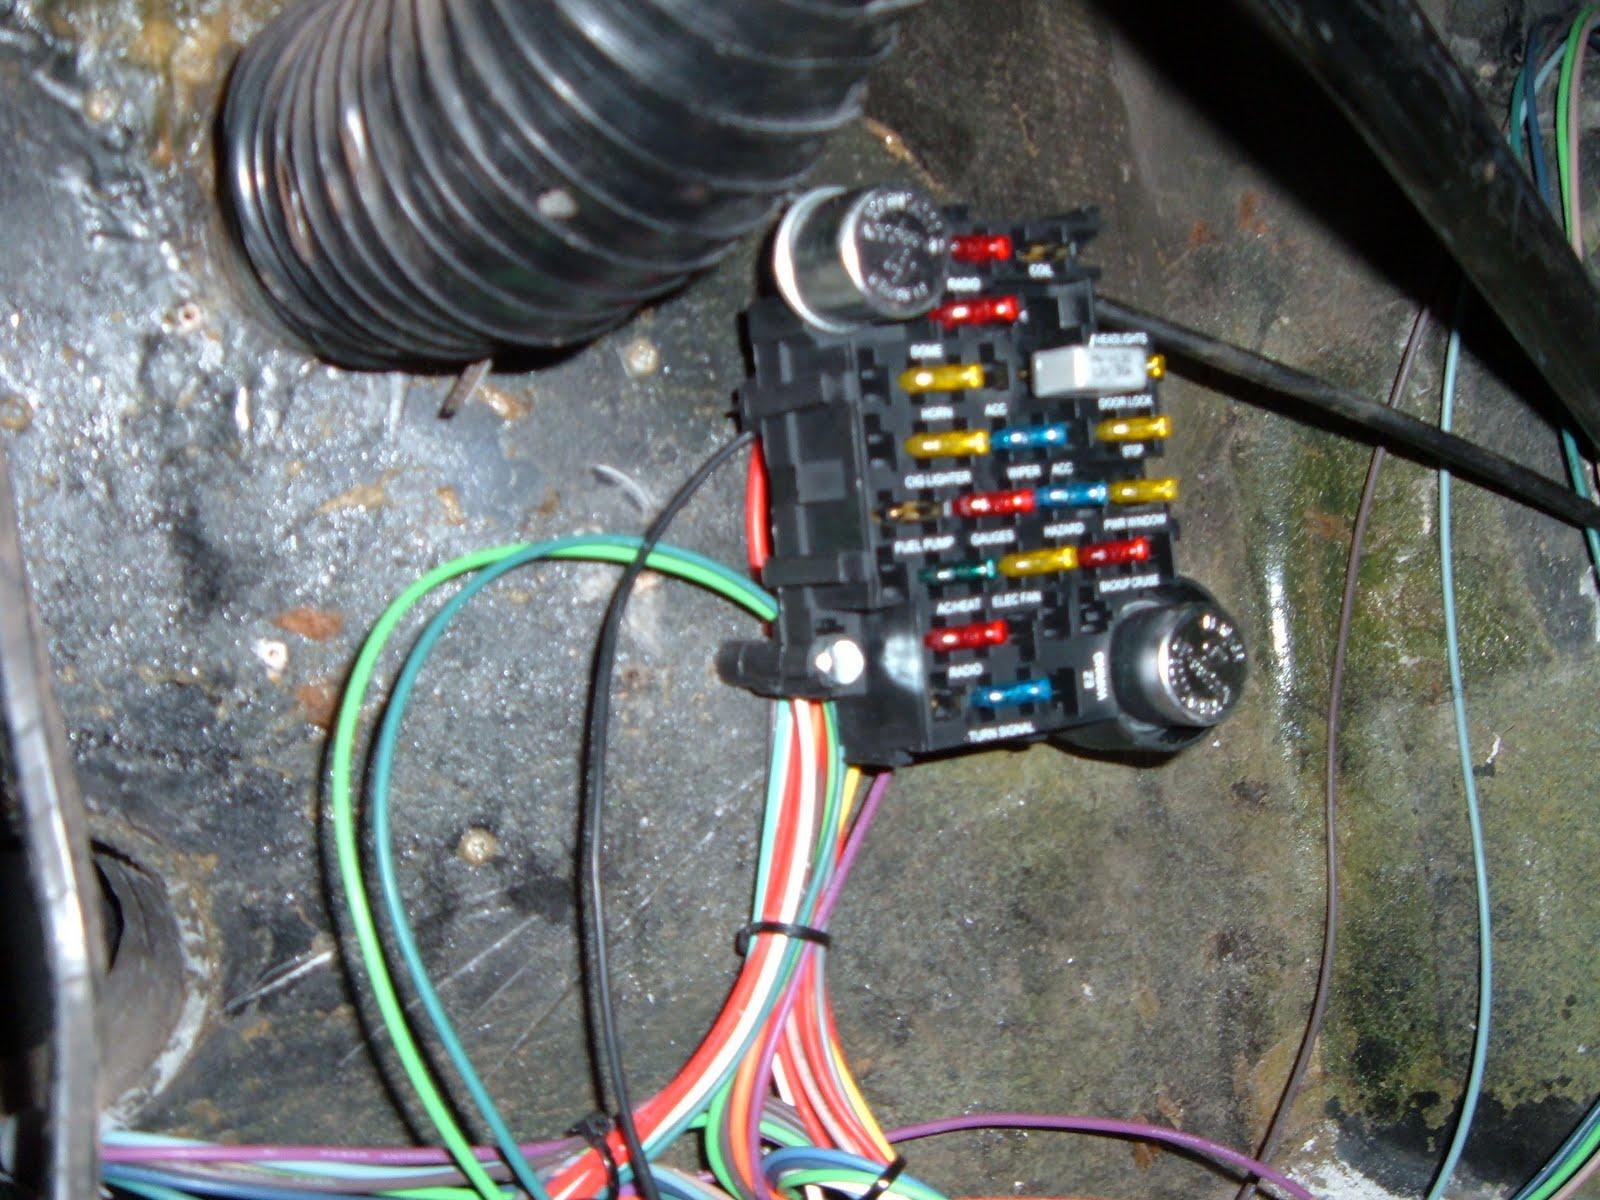 ez wiring fuse box wiring diagram post ez wiring installation manual 12 ez wiring installation [ 1600 x 1200 Pixel ]